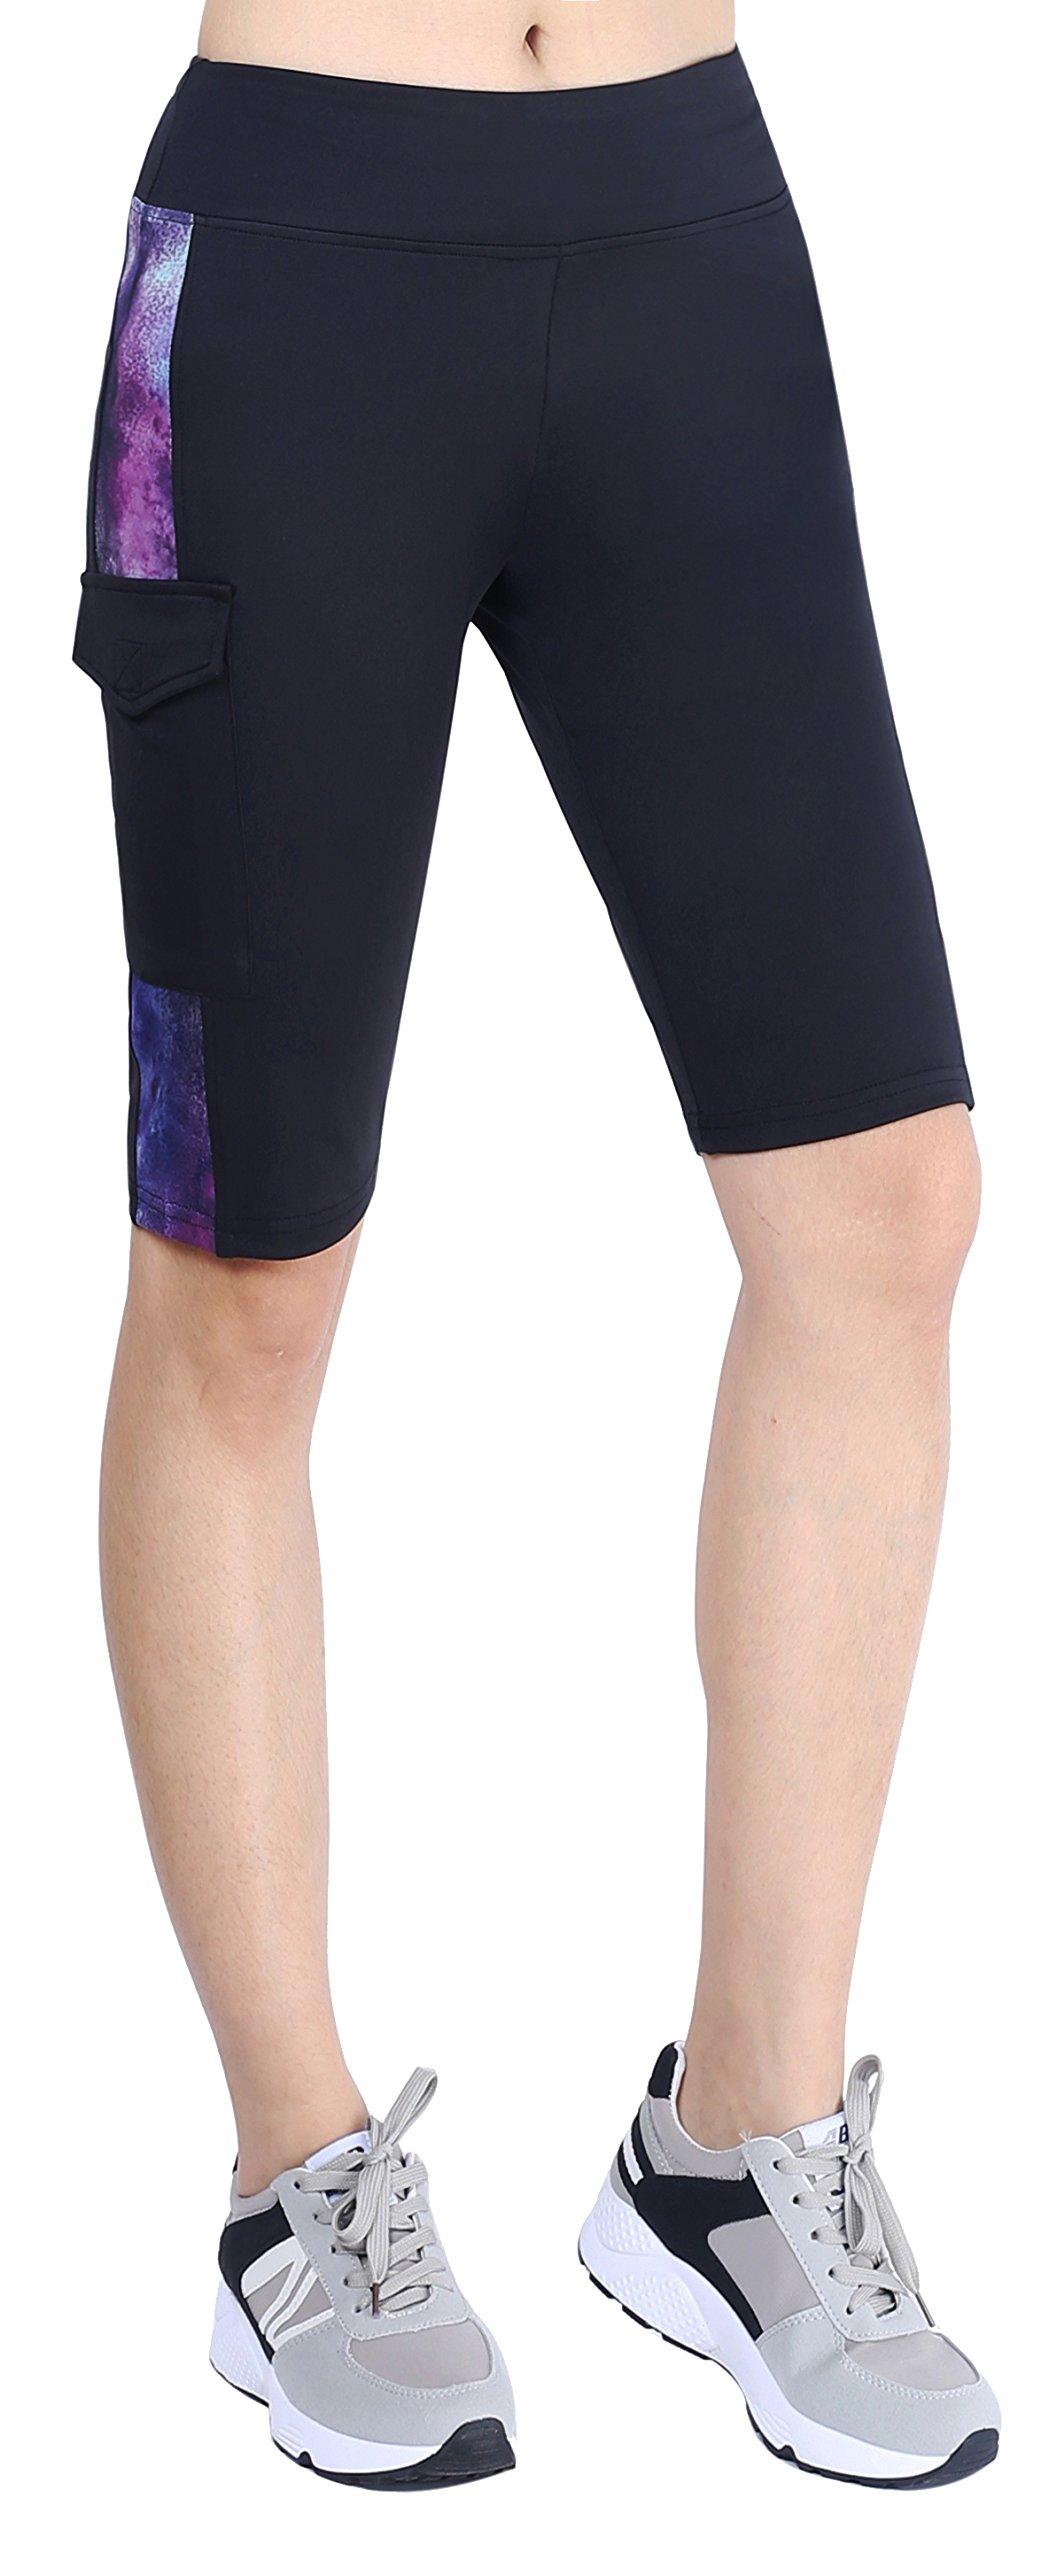 Neonysweets Womens Capri Tights Fitness Running Yoga Pants Leggings Black Printed M